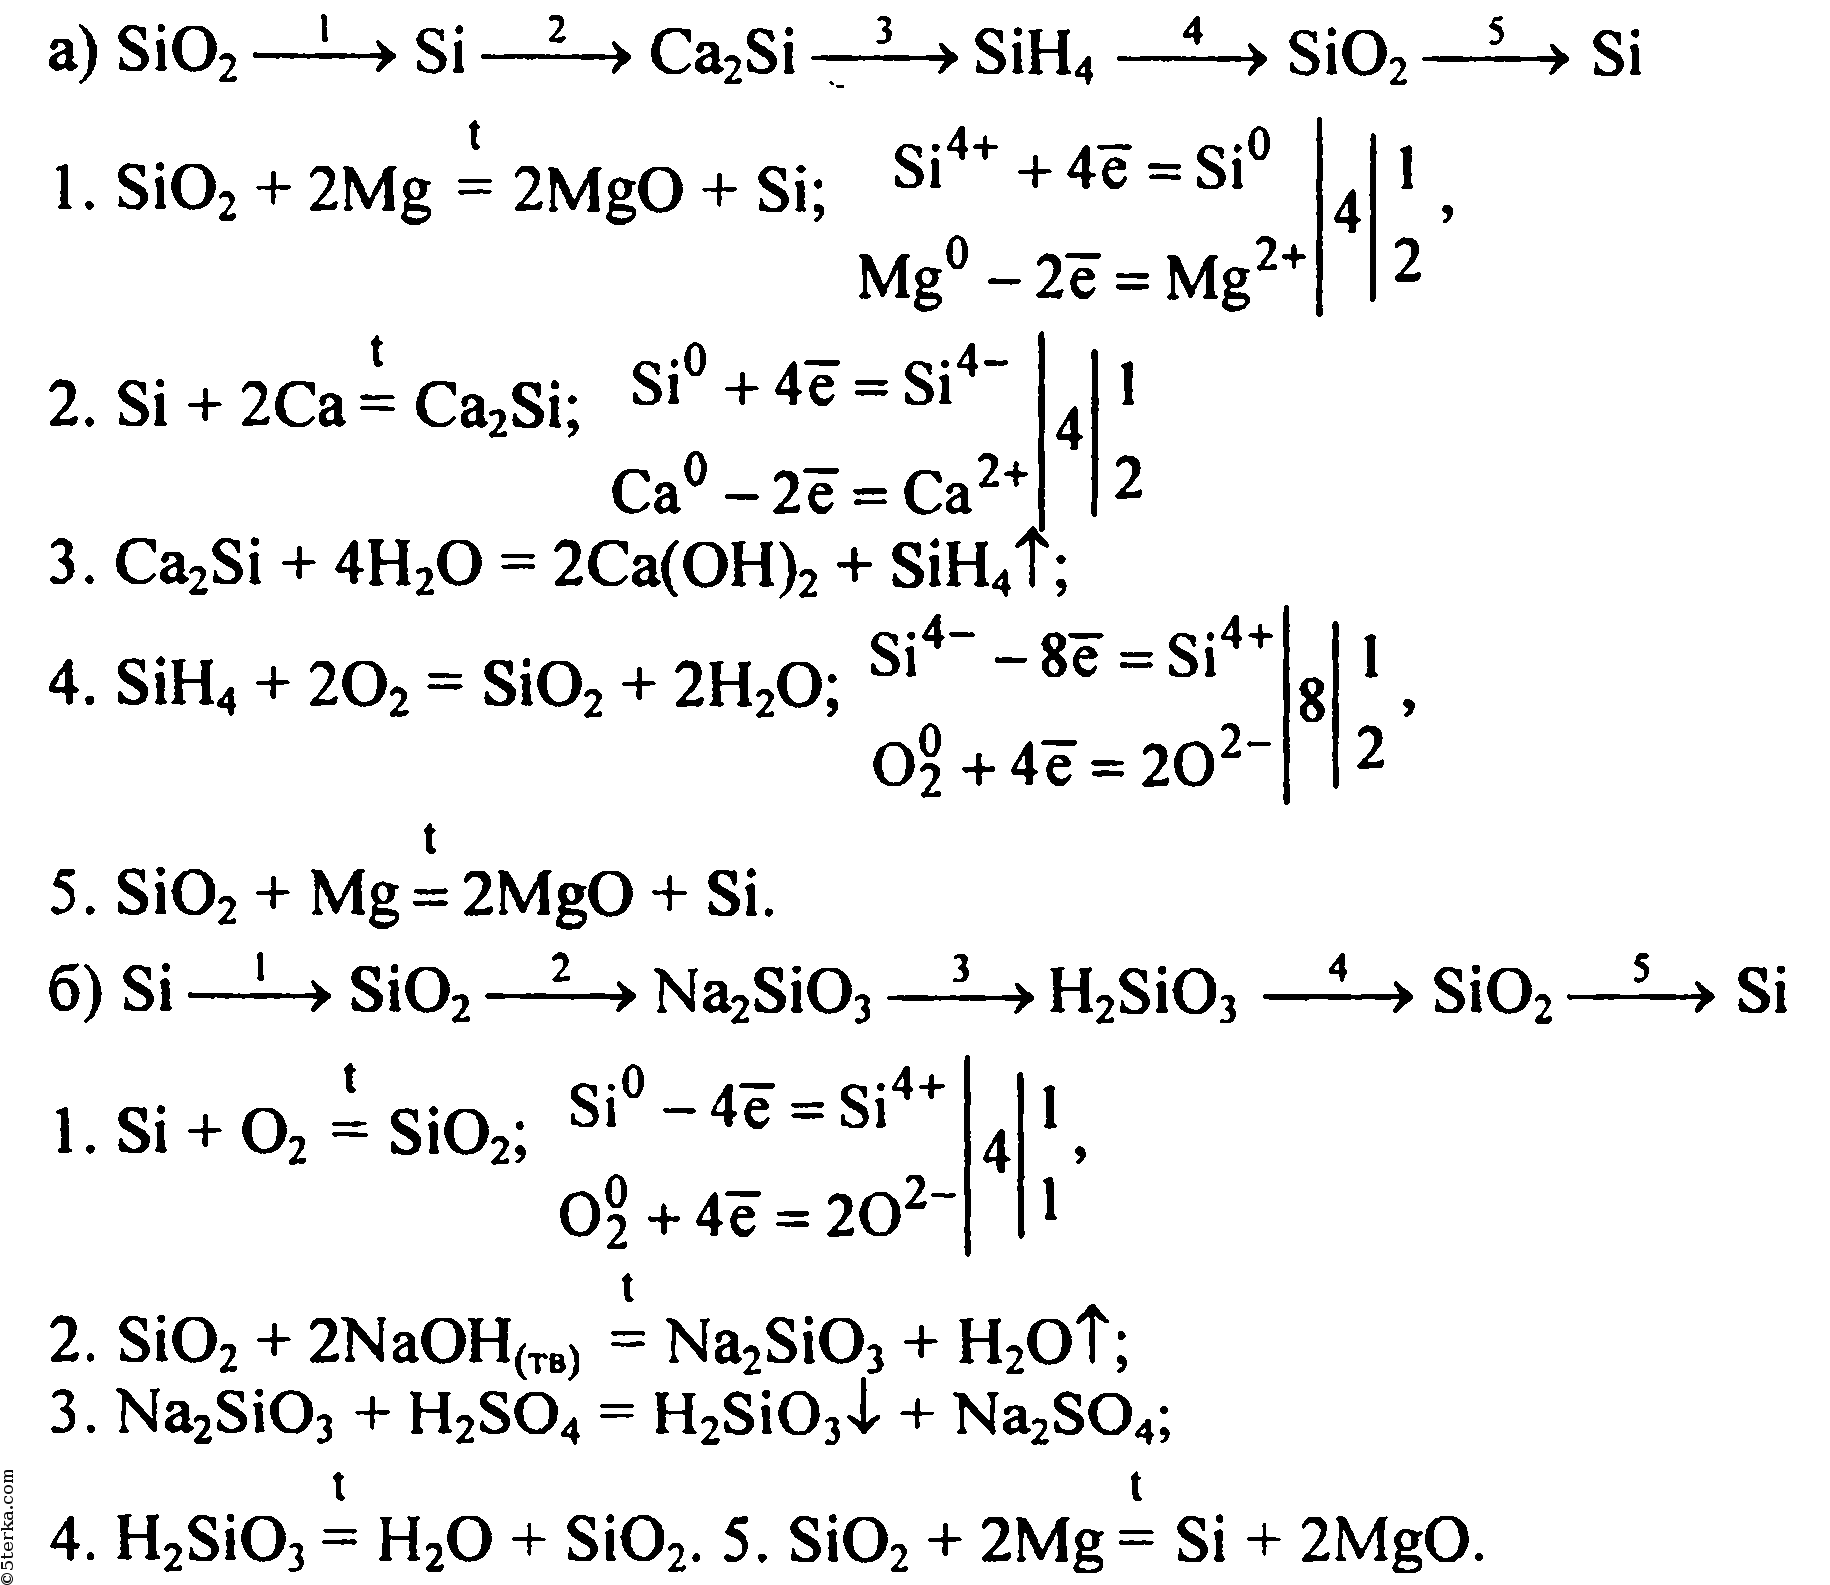 Гдз по химии запишите уравнение реакций